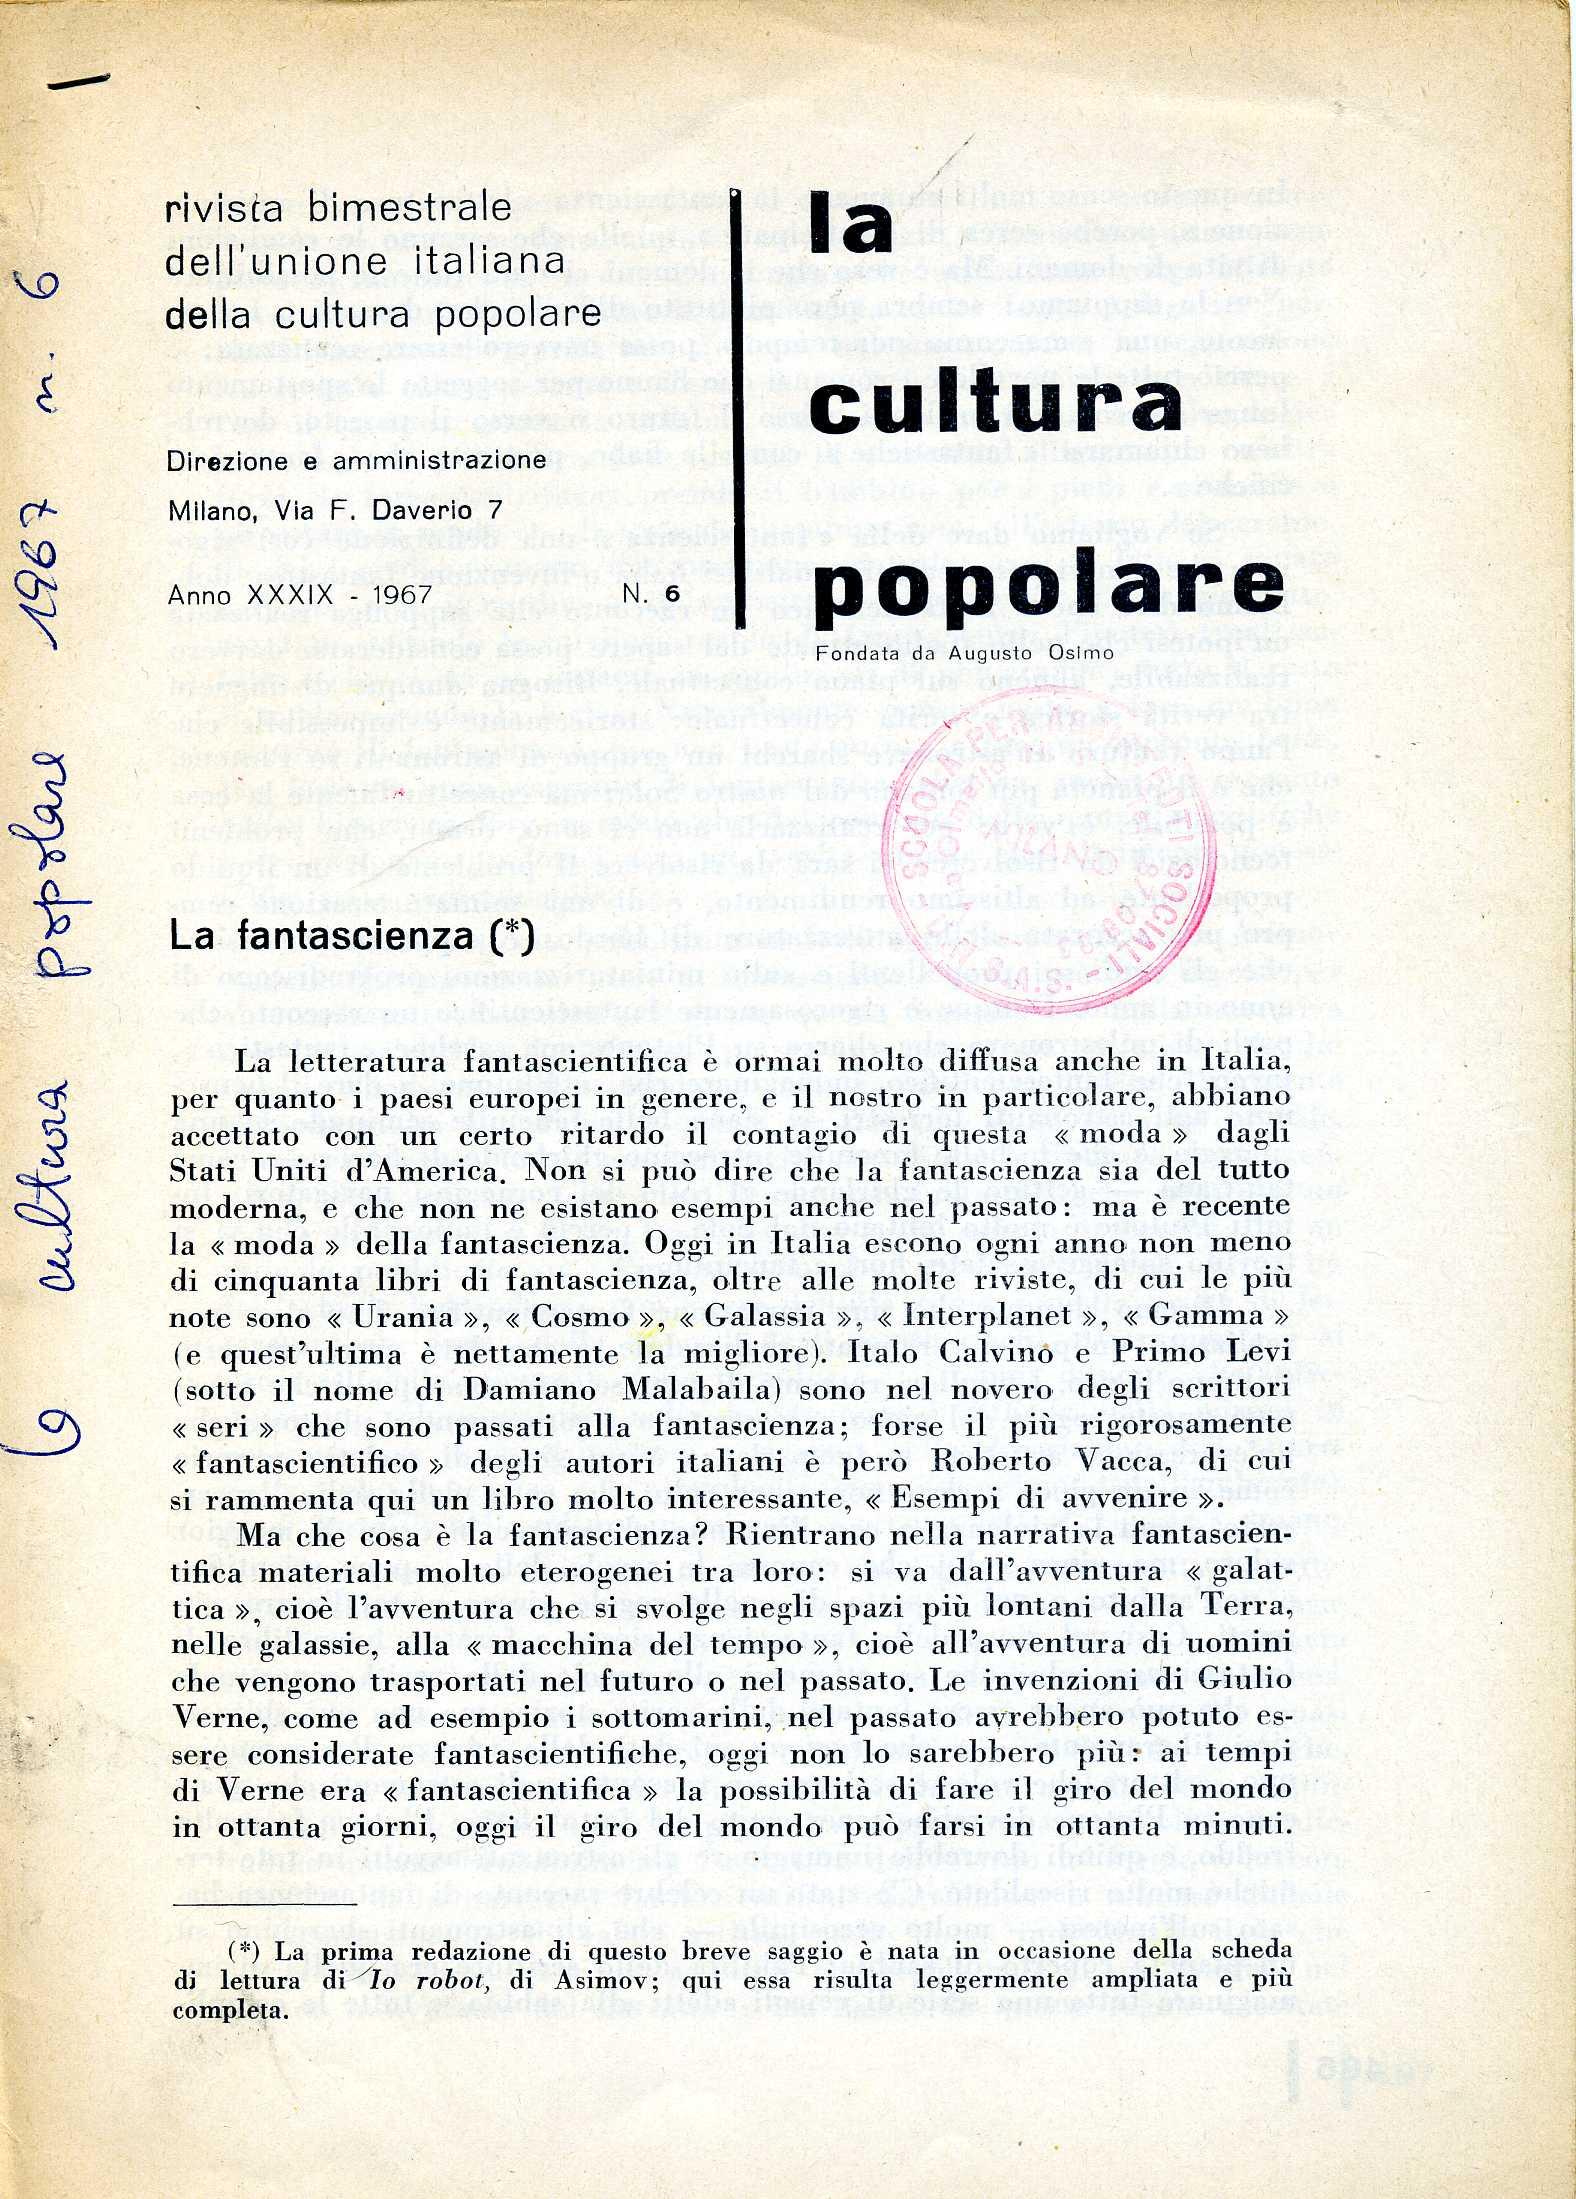 L  CONTI FANTASCIENZA1969